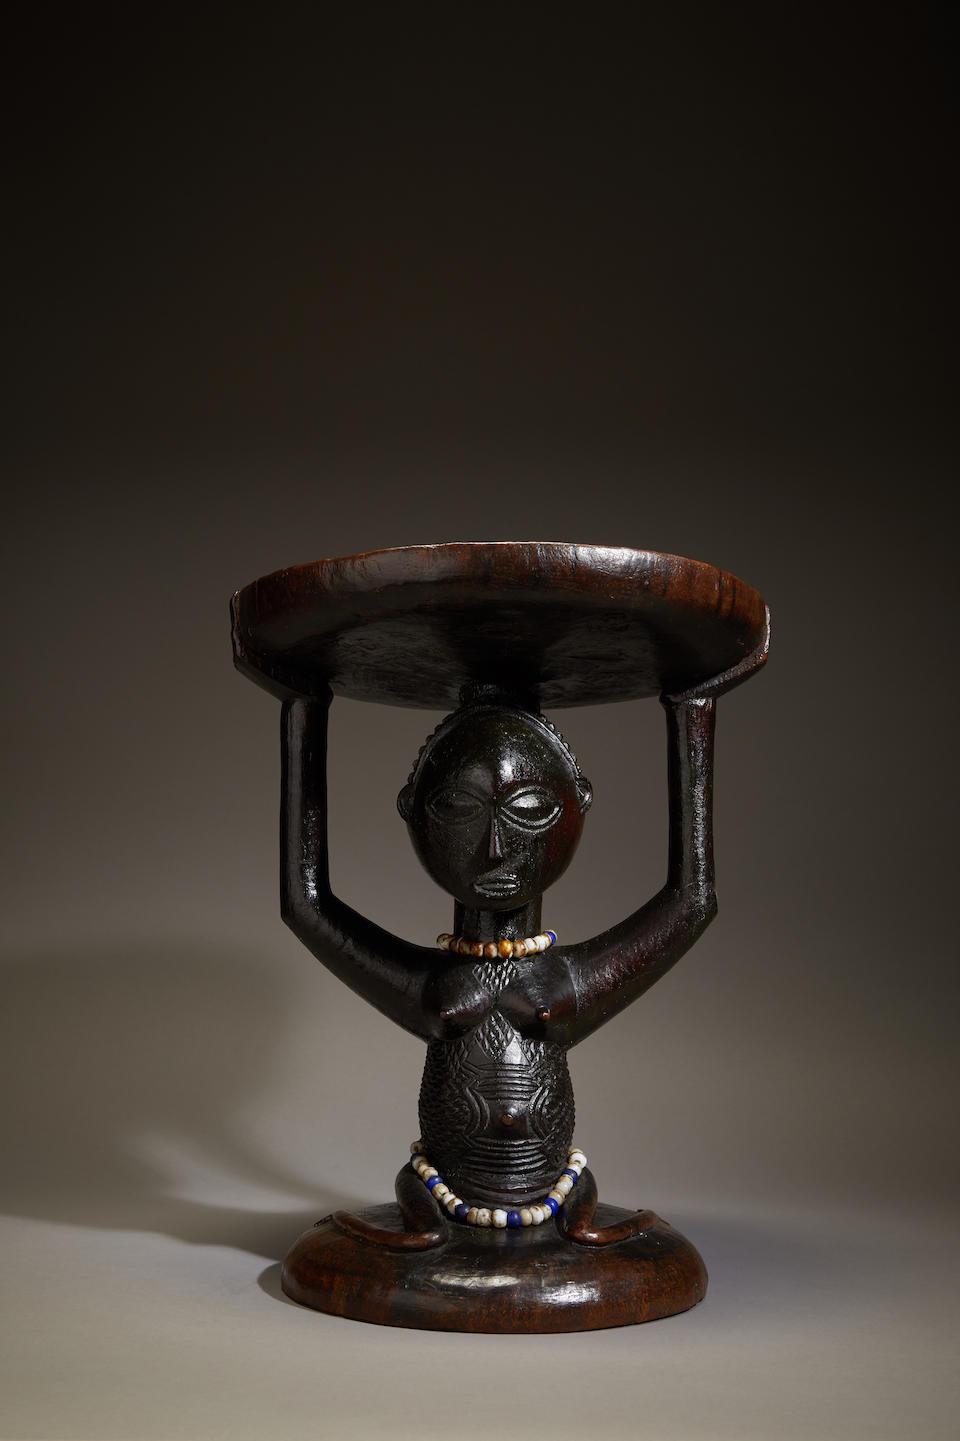 Superb Luba Female Caryatid Stool, Democratic Republic of the Congo